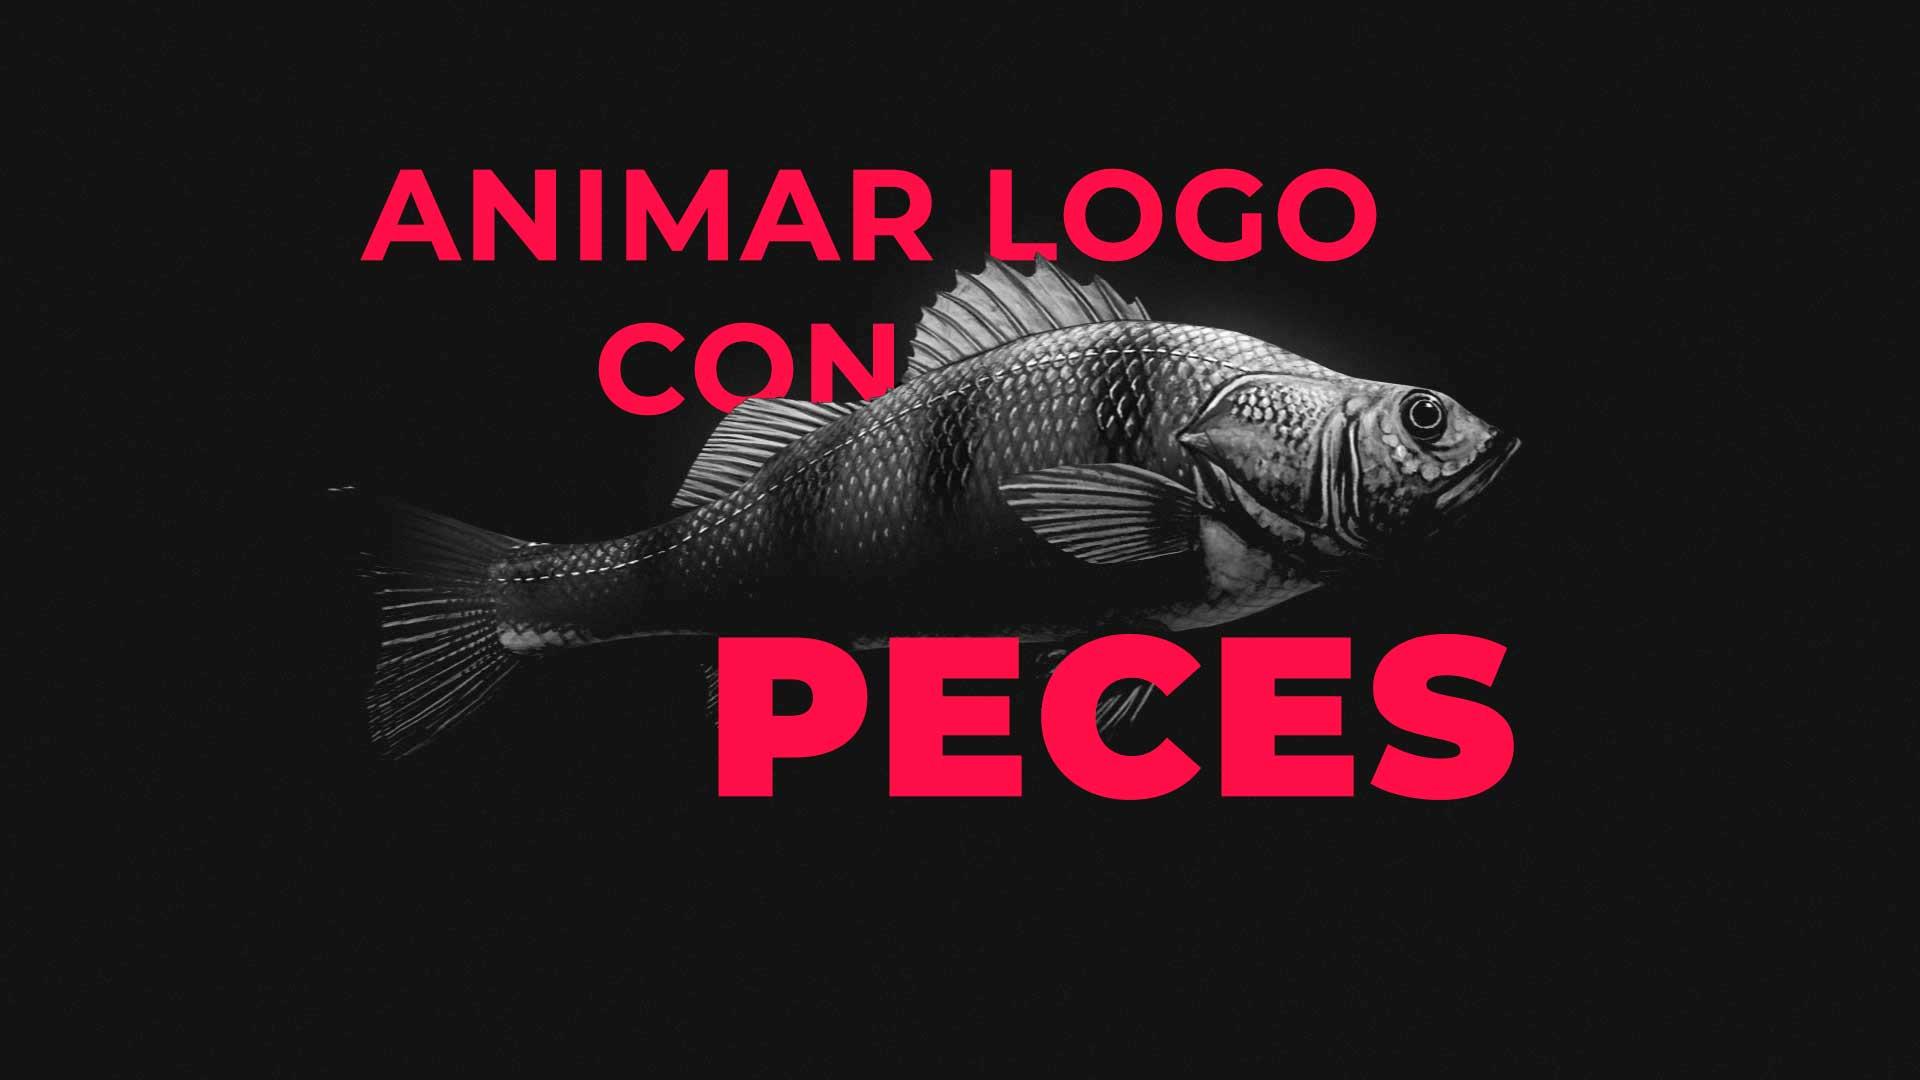 Animar-logo-peces-imagen-post-animarlogo